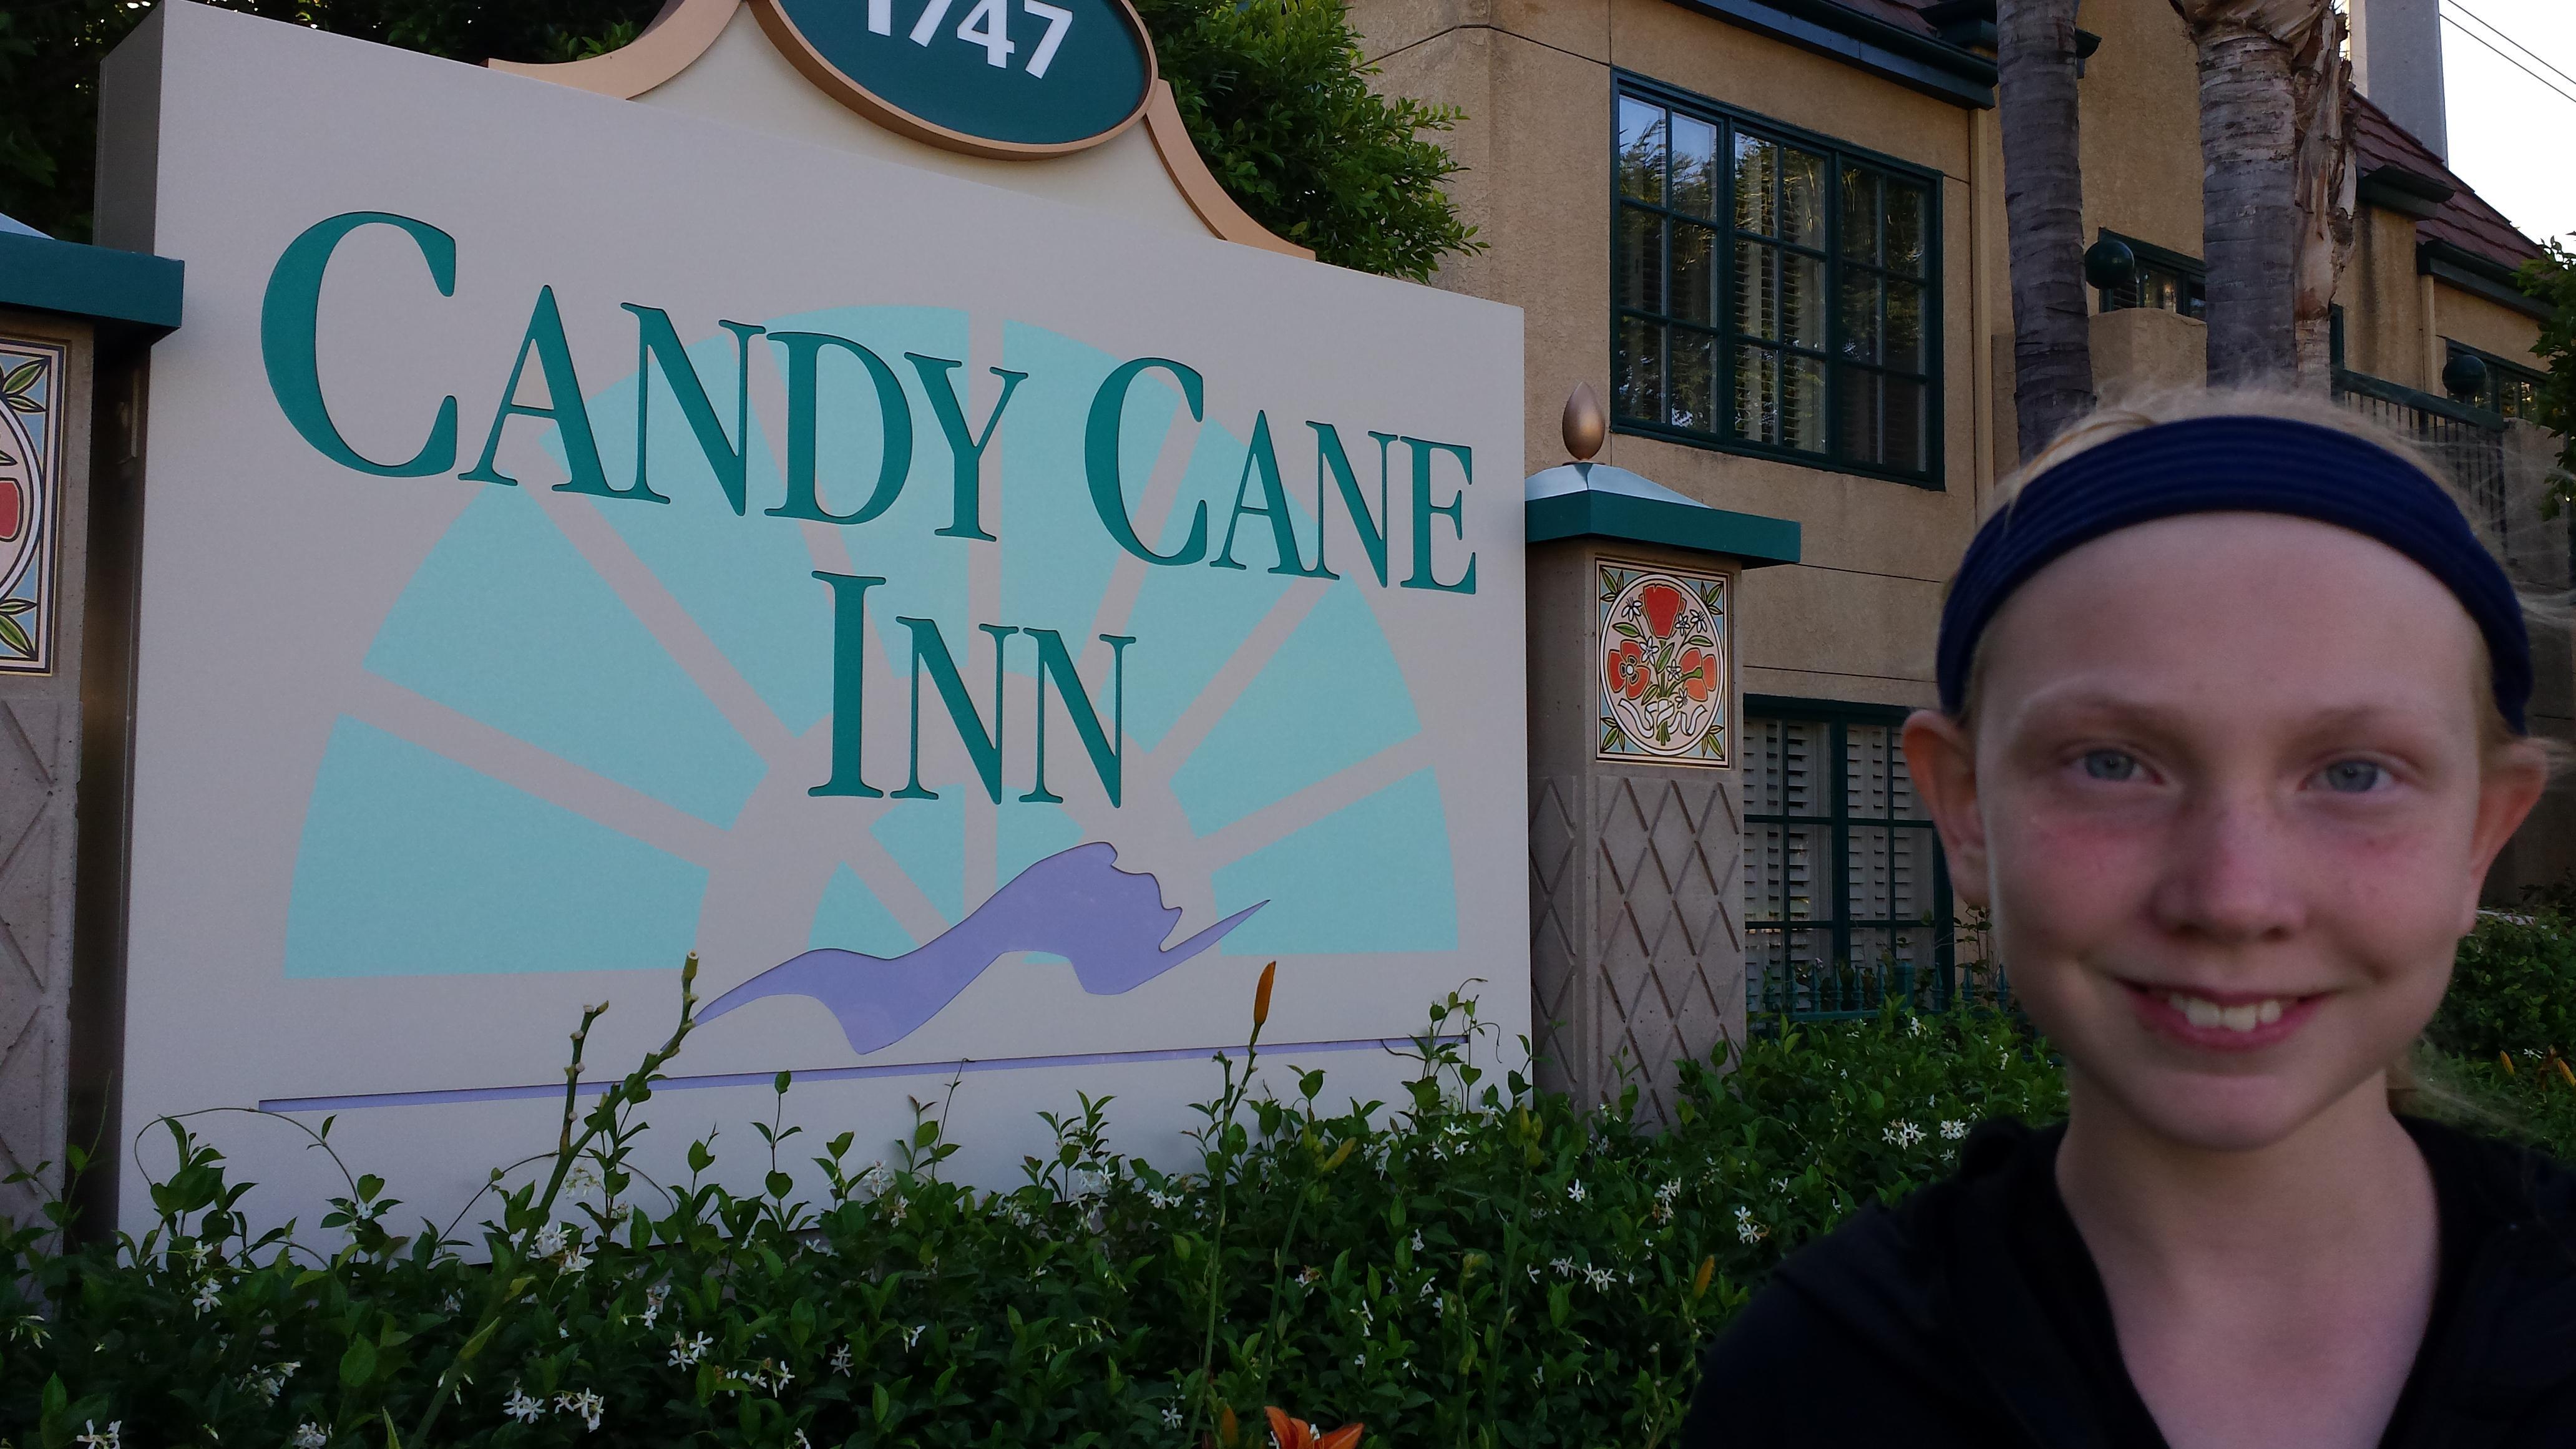 Candy Cane Inn